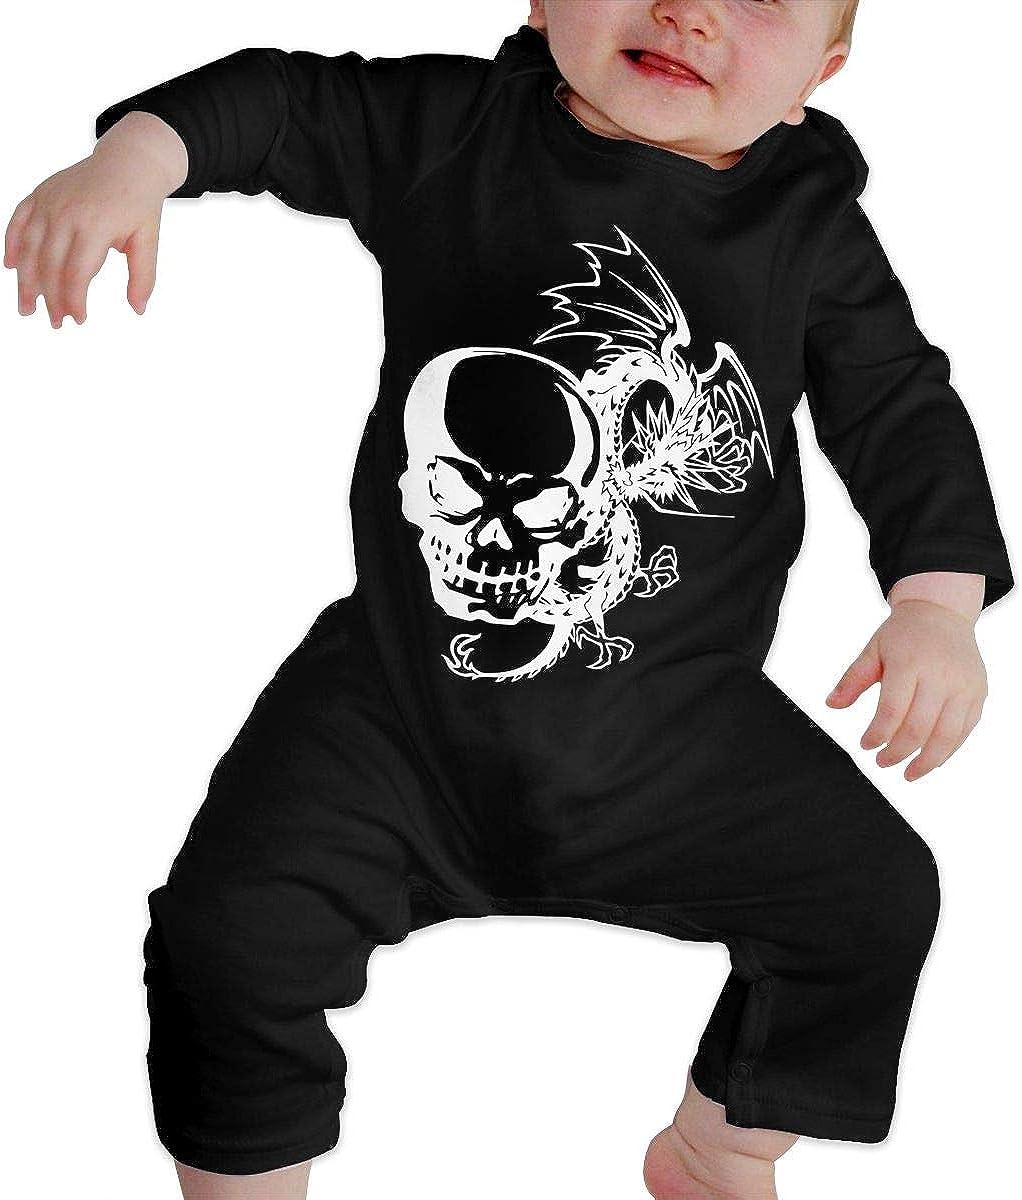 The Skull and A Dragon-1 Printed Newborn Baby Bodysuit Long Sleeve Romper Black